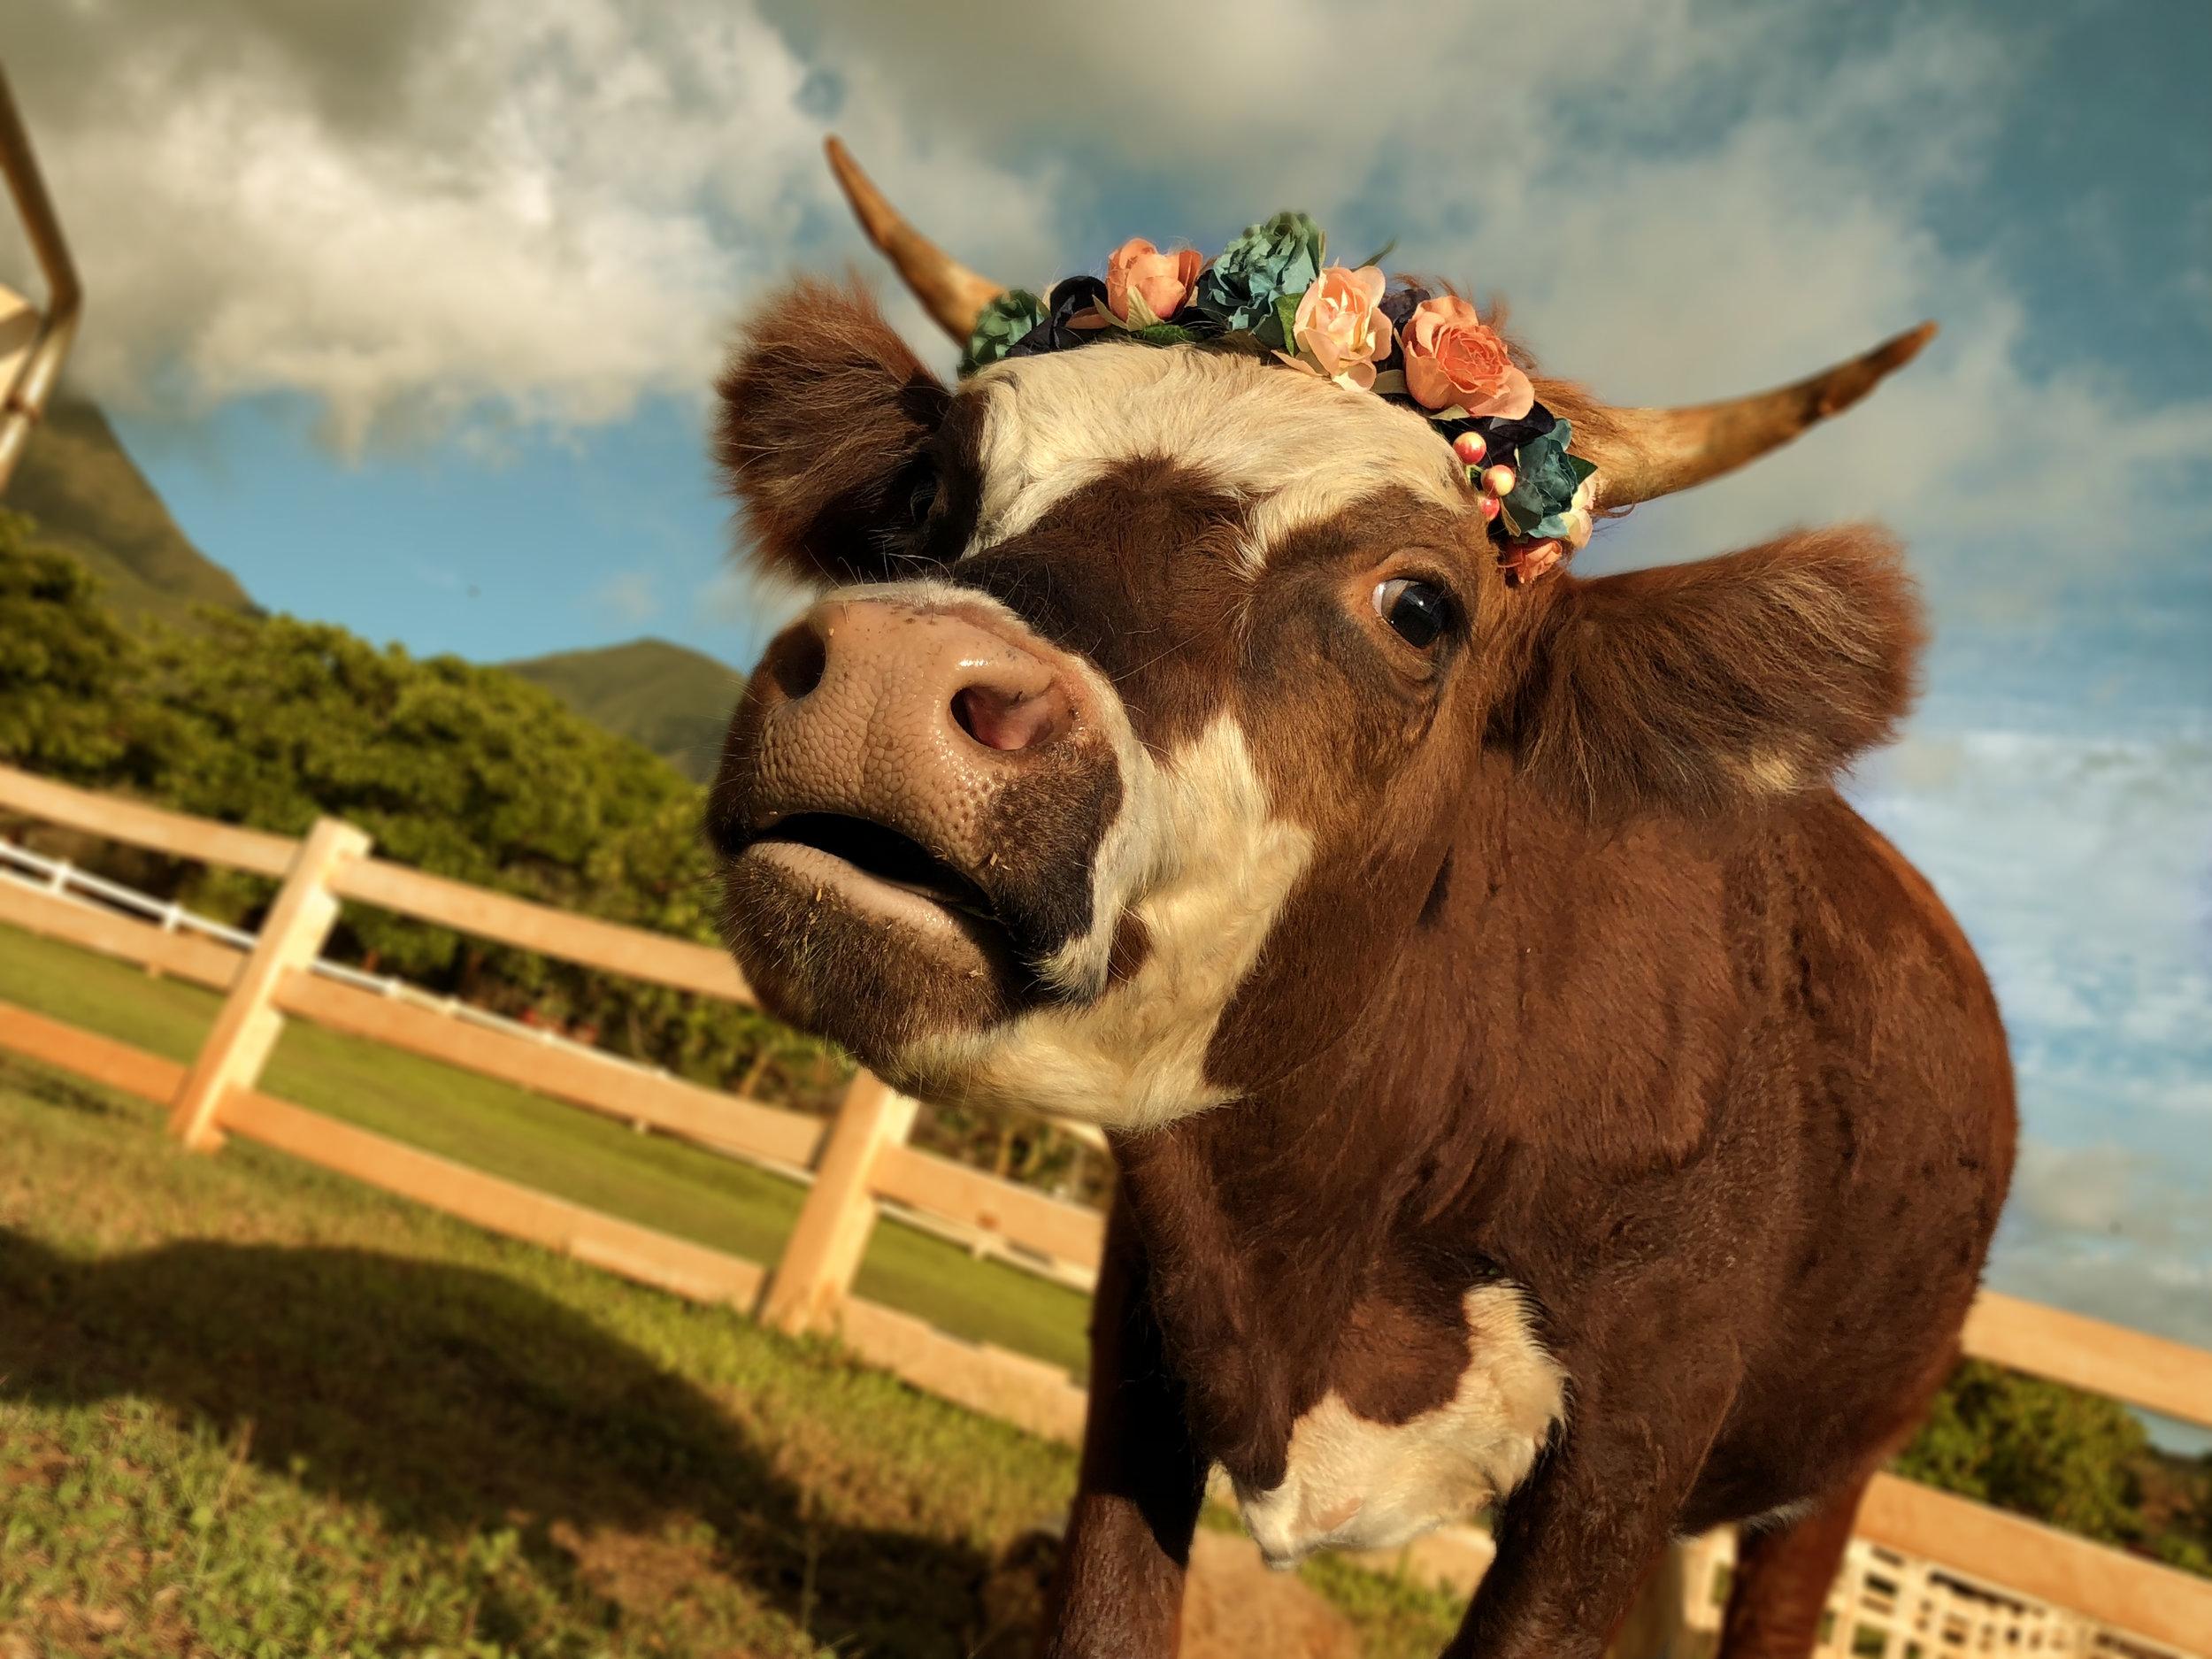 Maui-Lahaina-Animal-petting-zoo-cows2.jpg